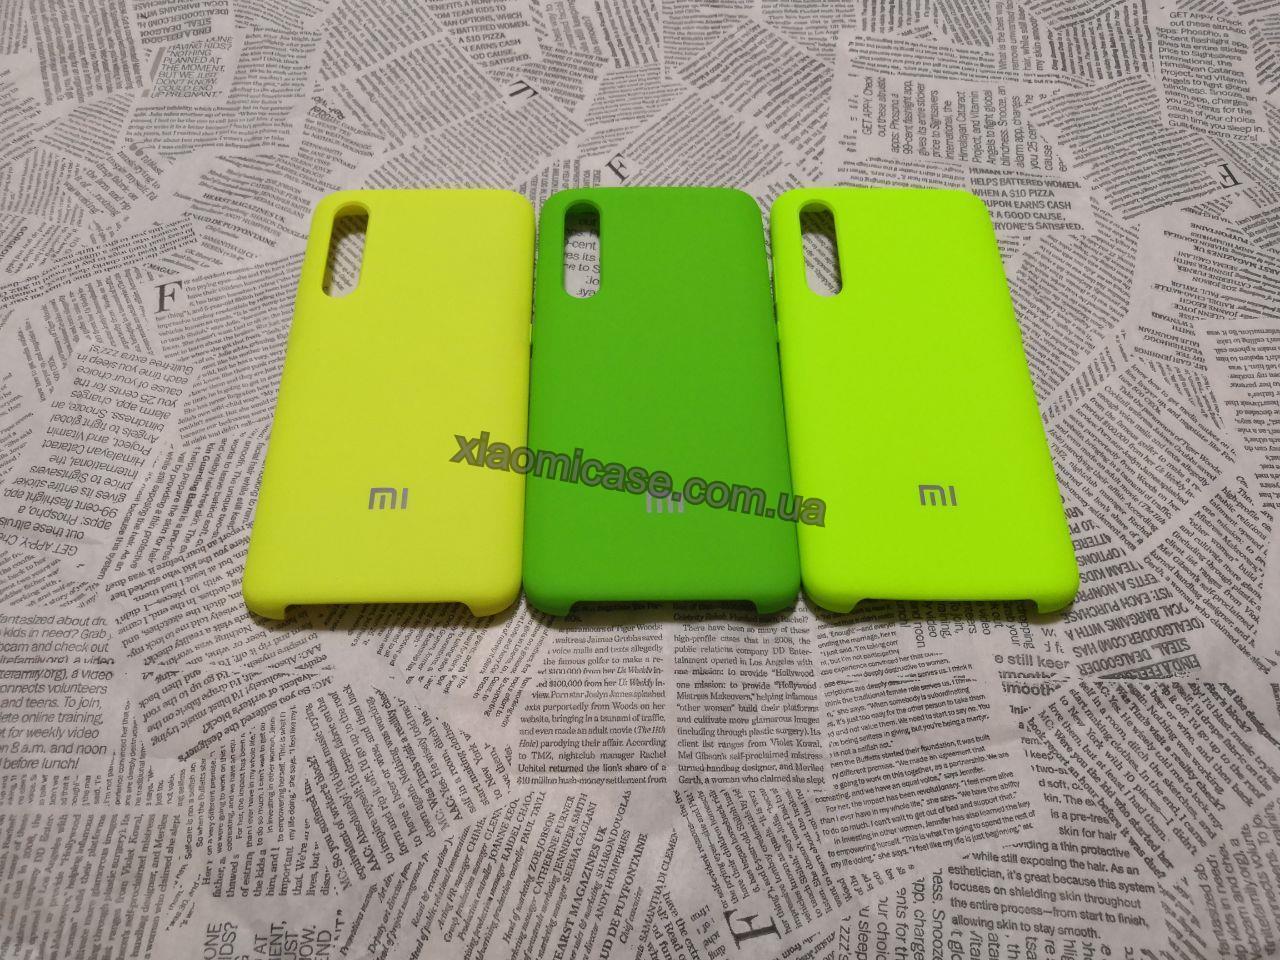 Брендовый Soft-touch чехолSilicone Cover для Xiaomi (Ксиоми) Mi 9 (Зеленый, Лайм и Ярко желтый)